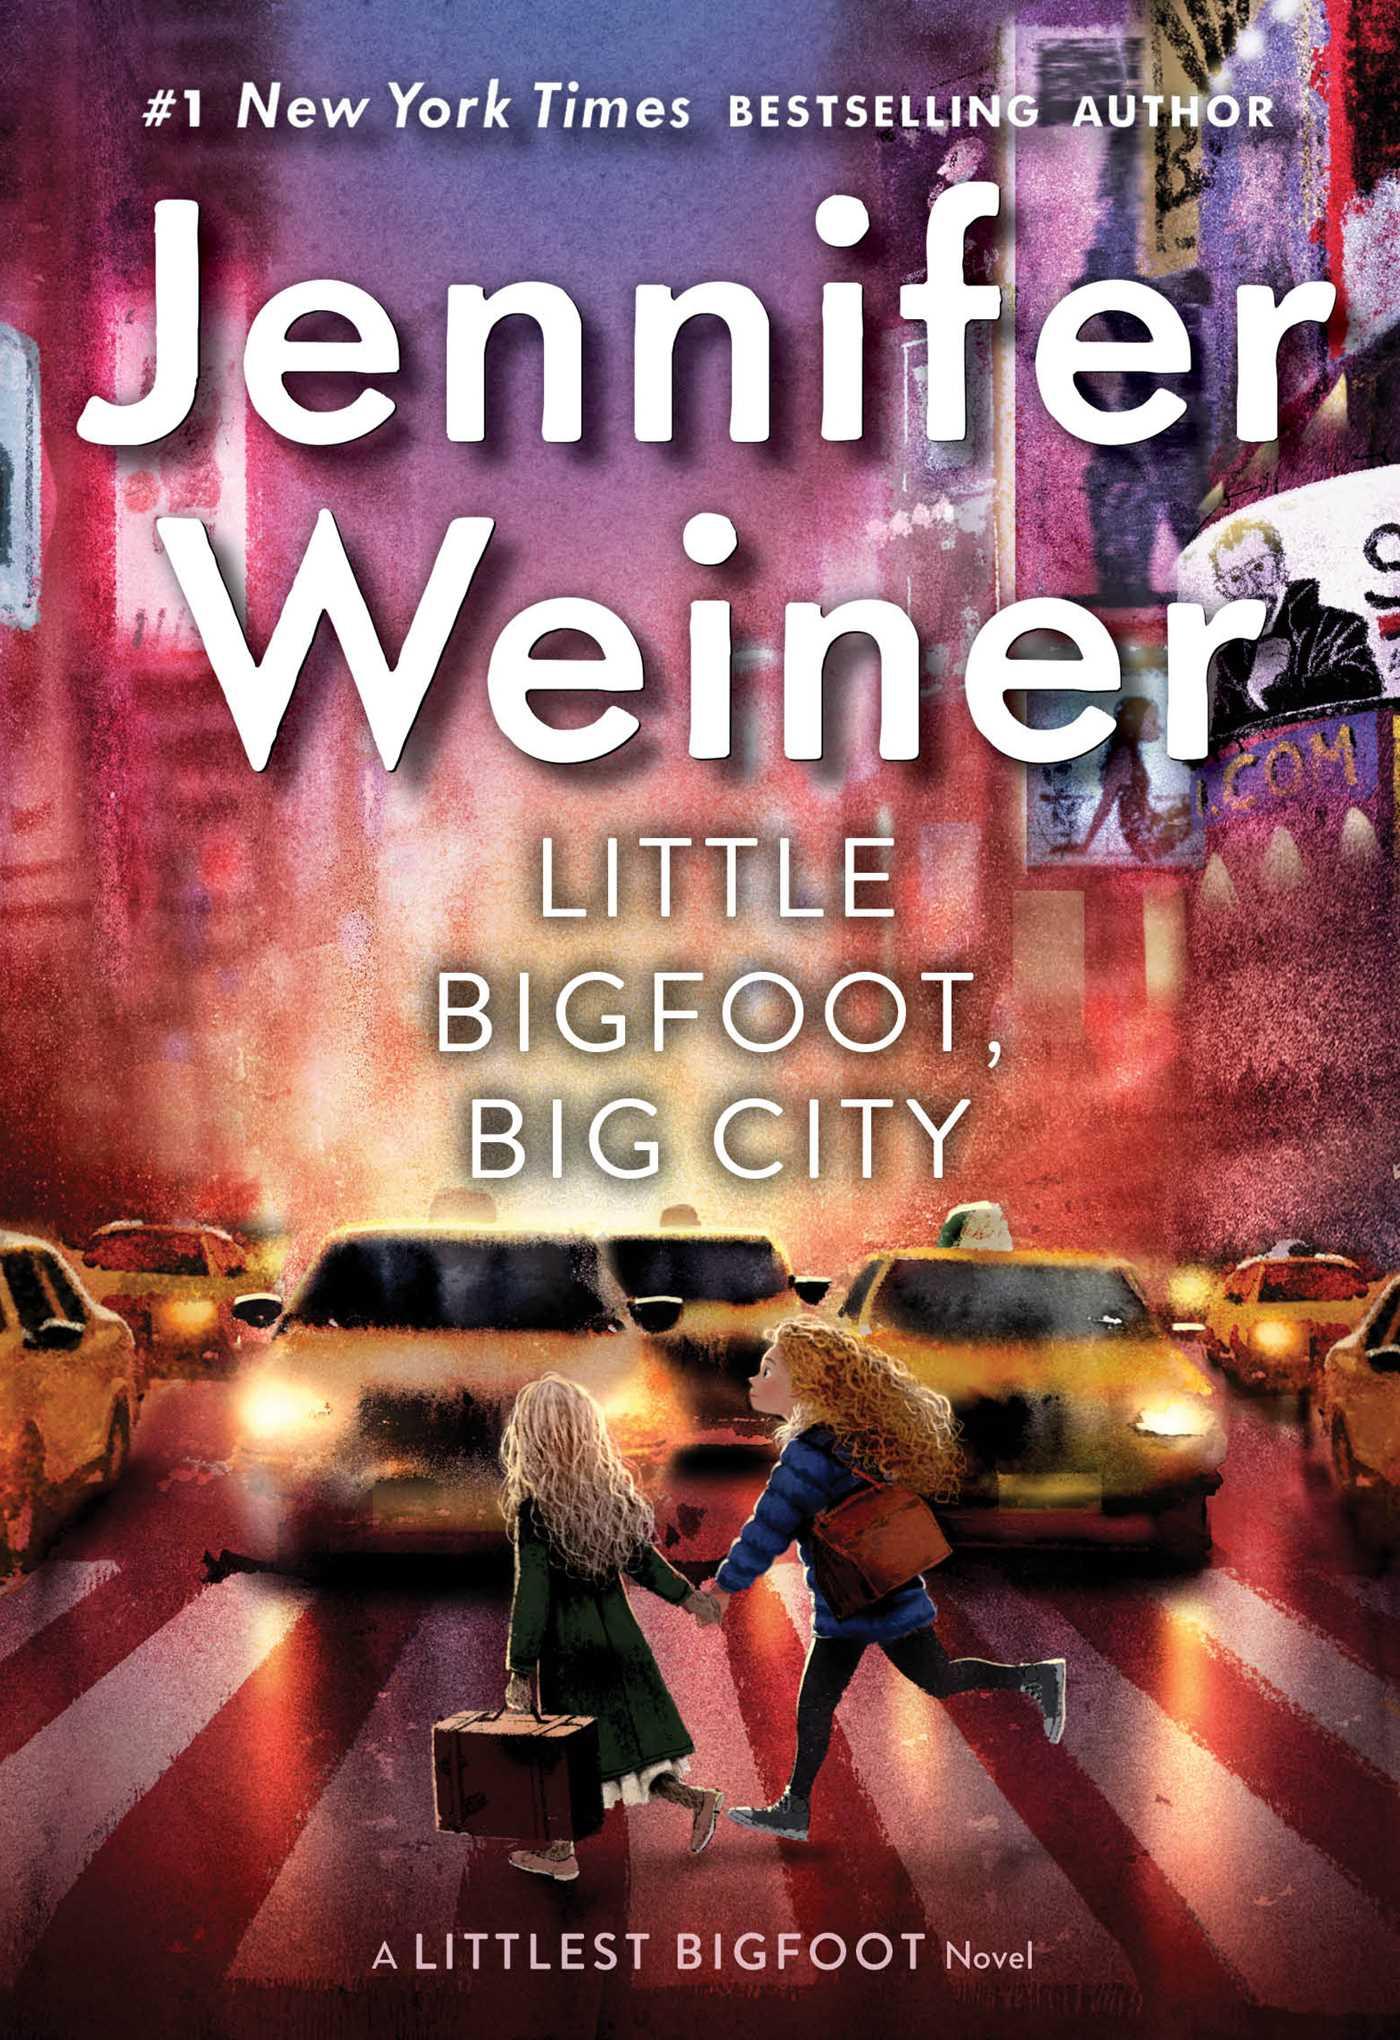 Book Cover Image (jpg): Little Bigfoot, Big City